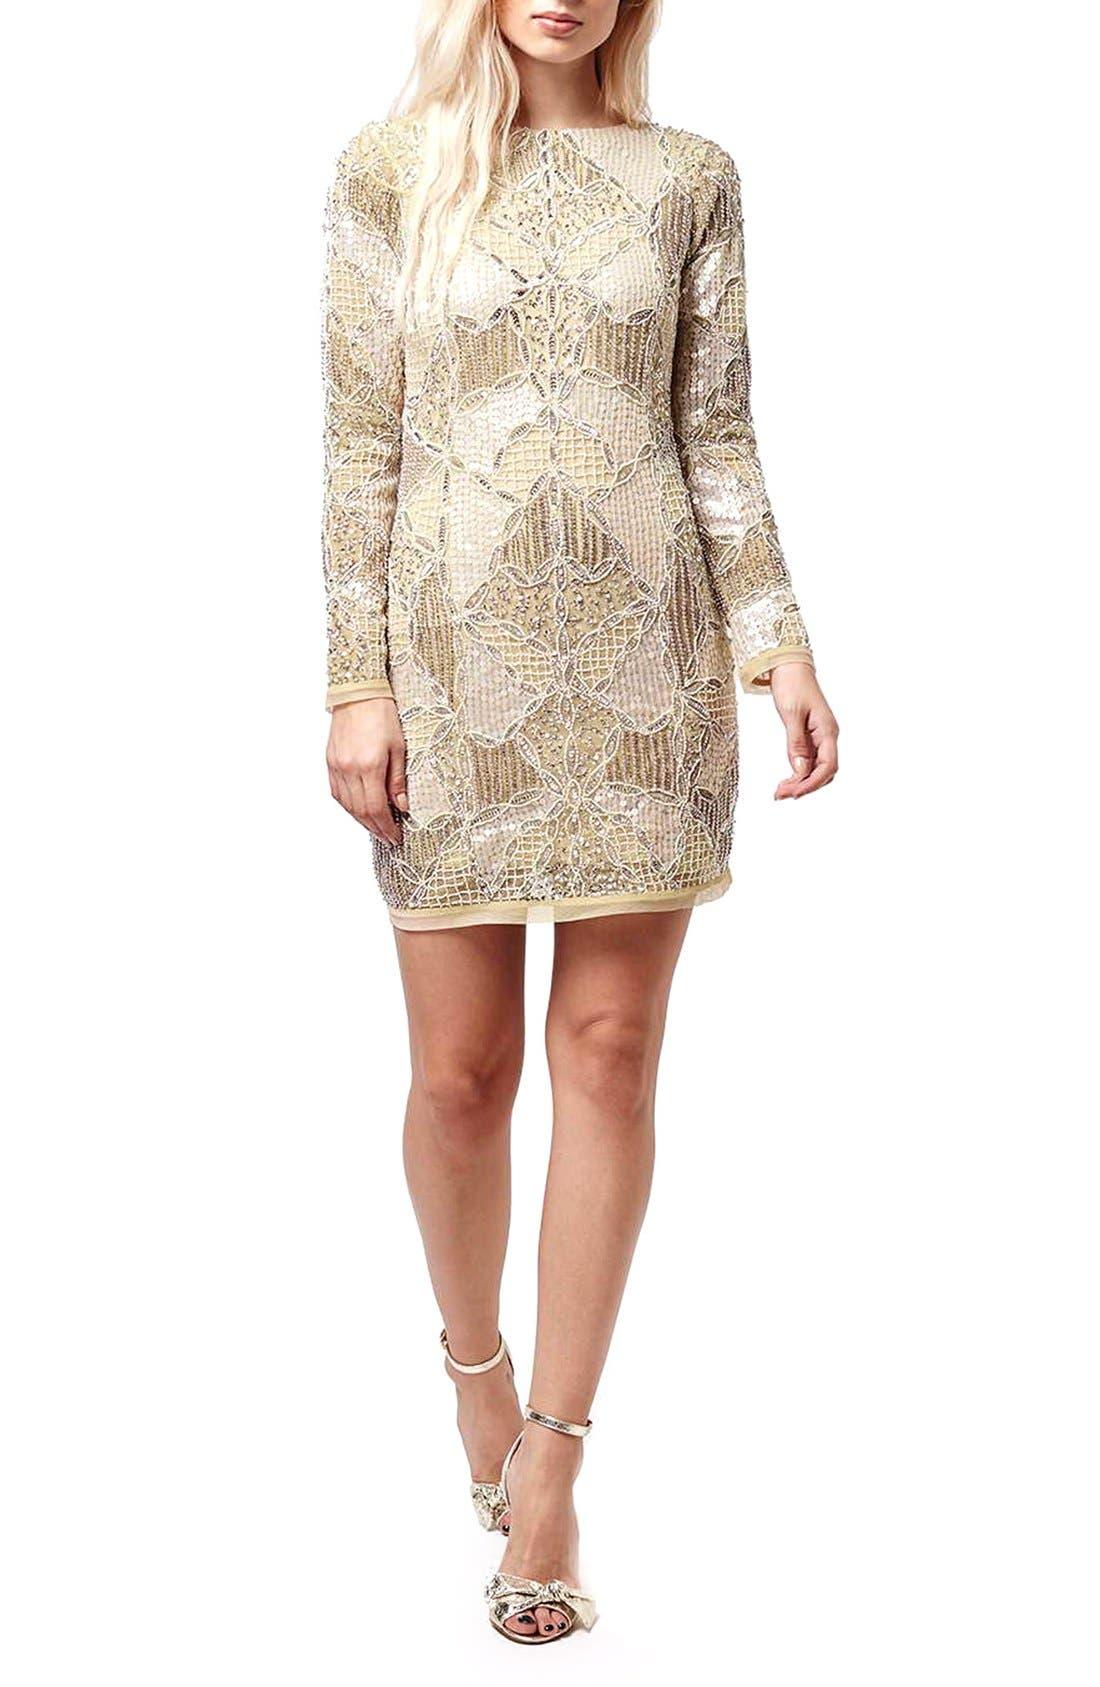 Alternate Image 1 Selected - Topshop 'Gigi' Embellished Body-Con Dress (Regular & Petite)